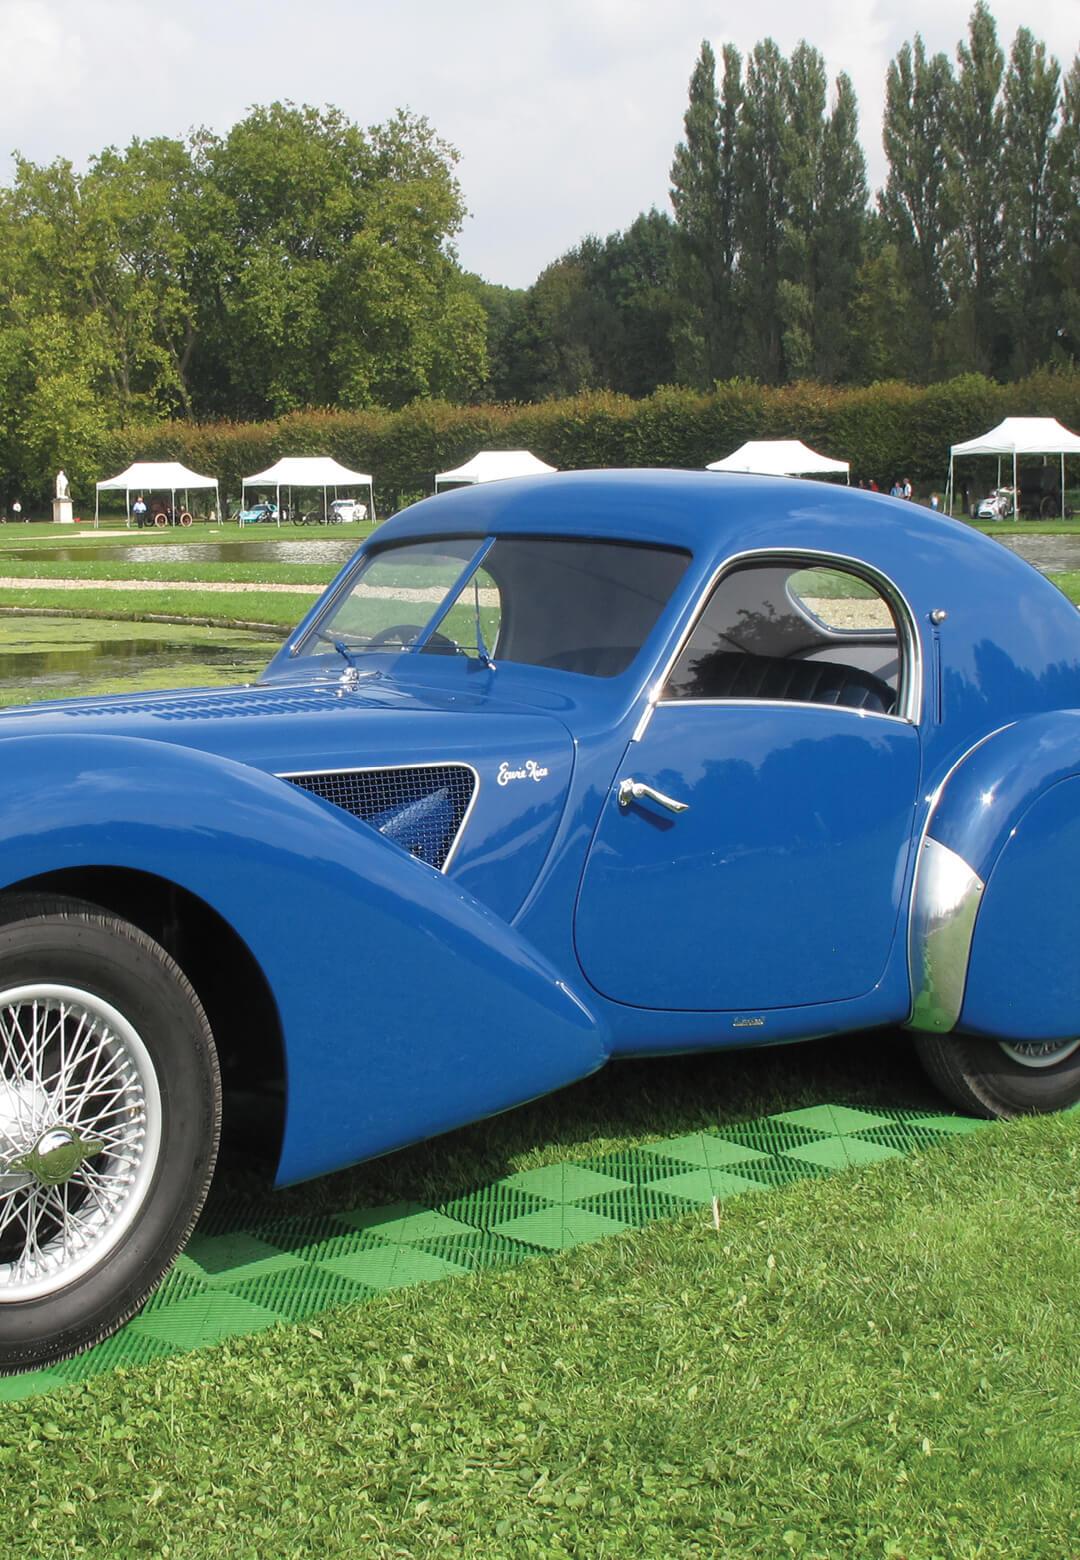 A Georges Paulin design based on a Talbot-Lago | Freewheeling | STIRworld